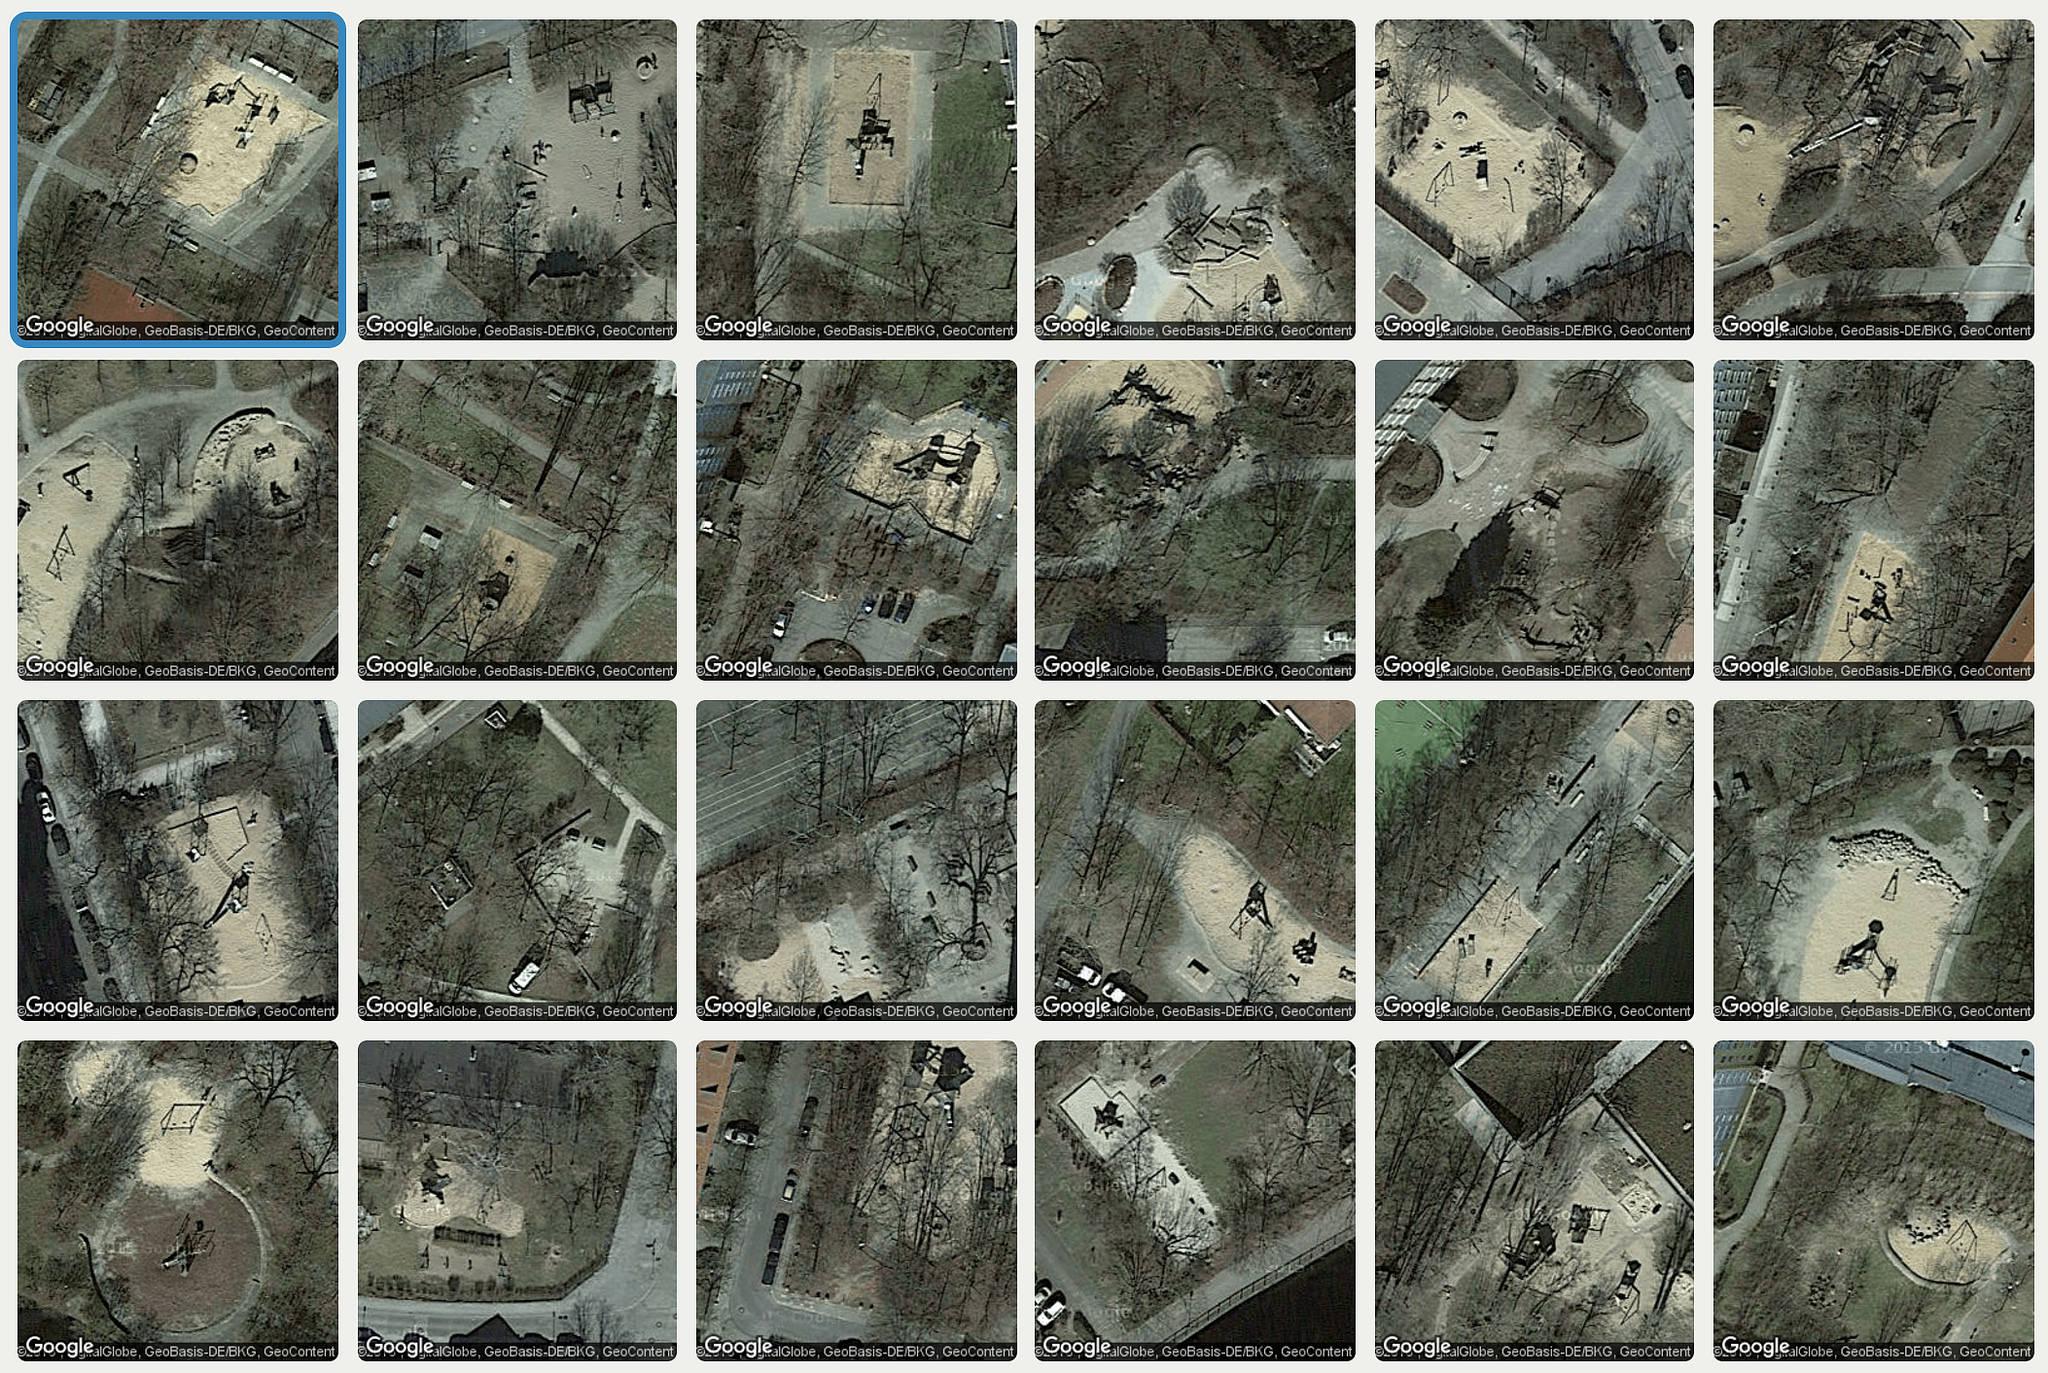 Satellite images of urban trees